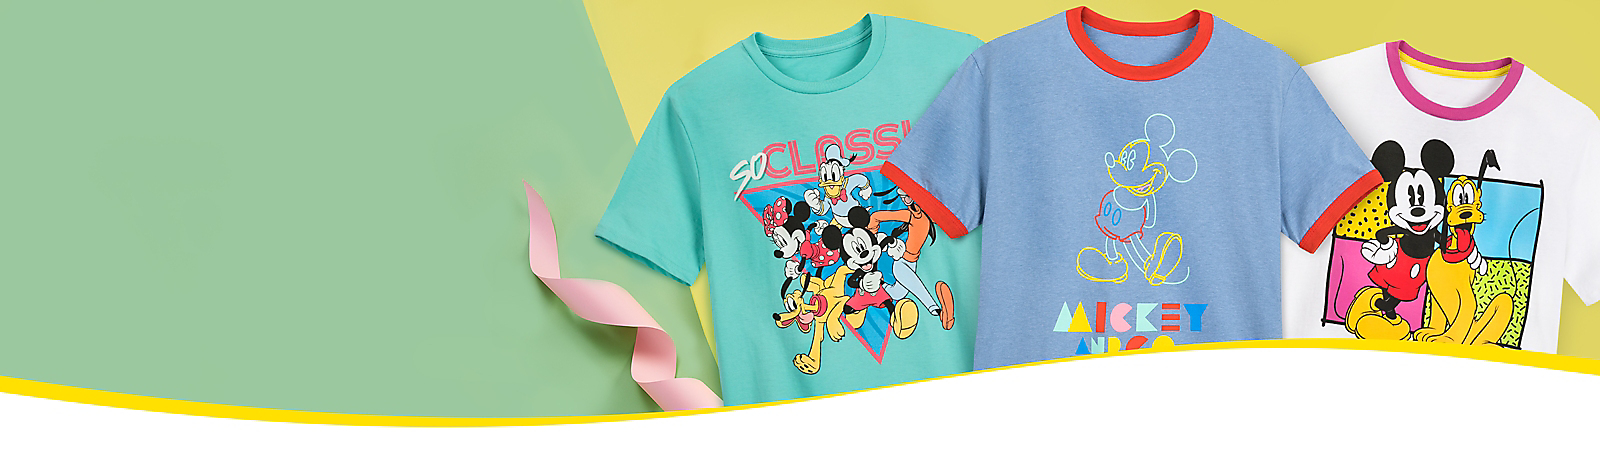 Cute DISNEY PRINCESS Snow White Ariel Alice Kids T-Shirt Gift For Girls Boys